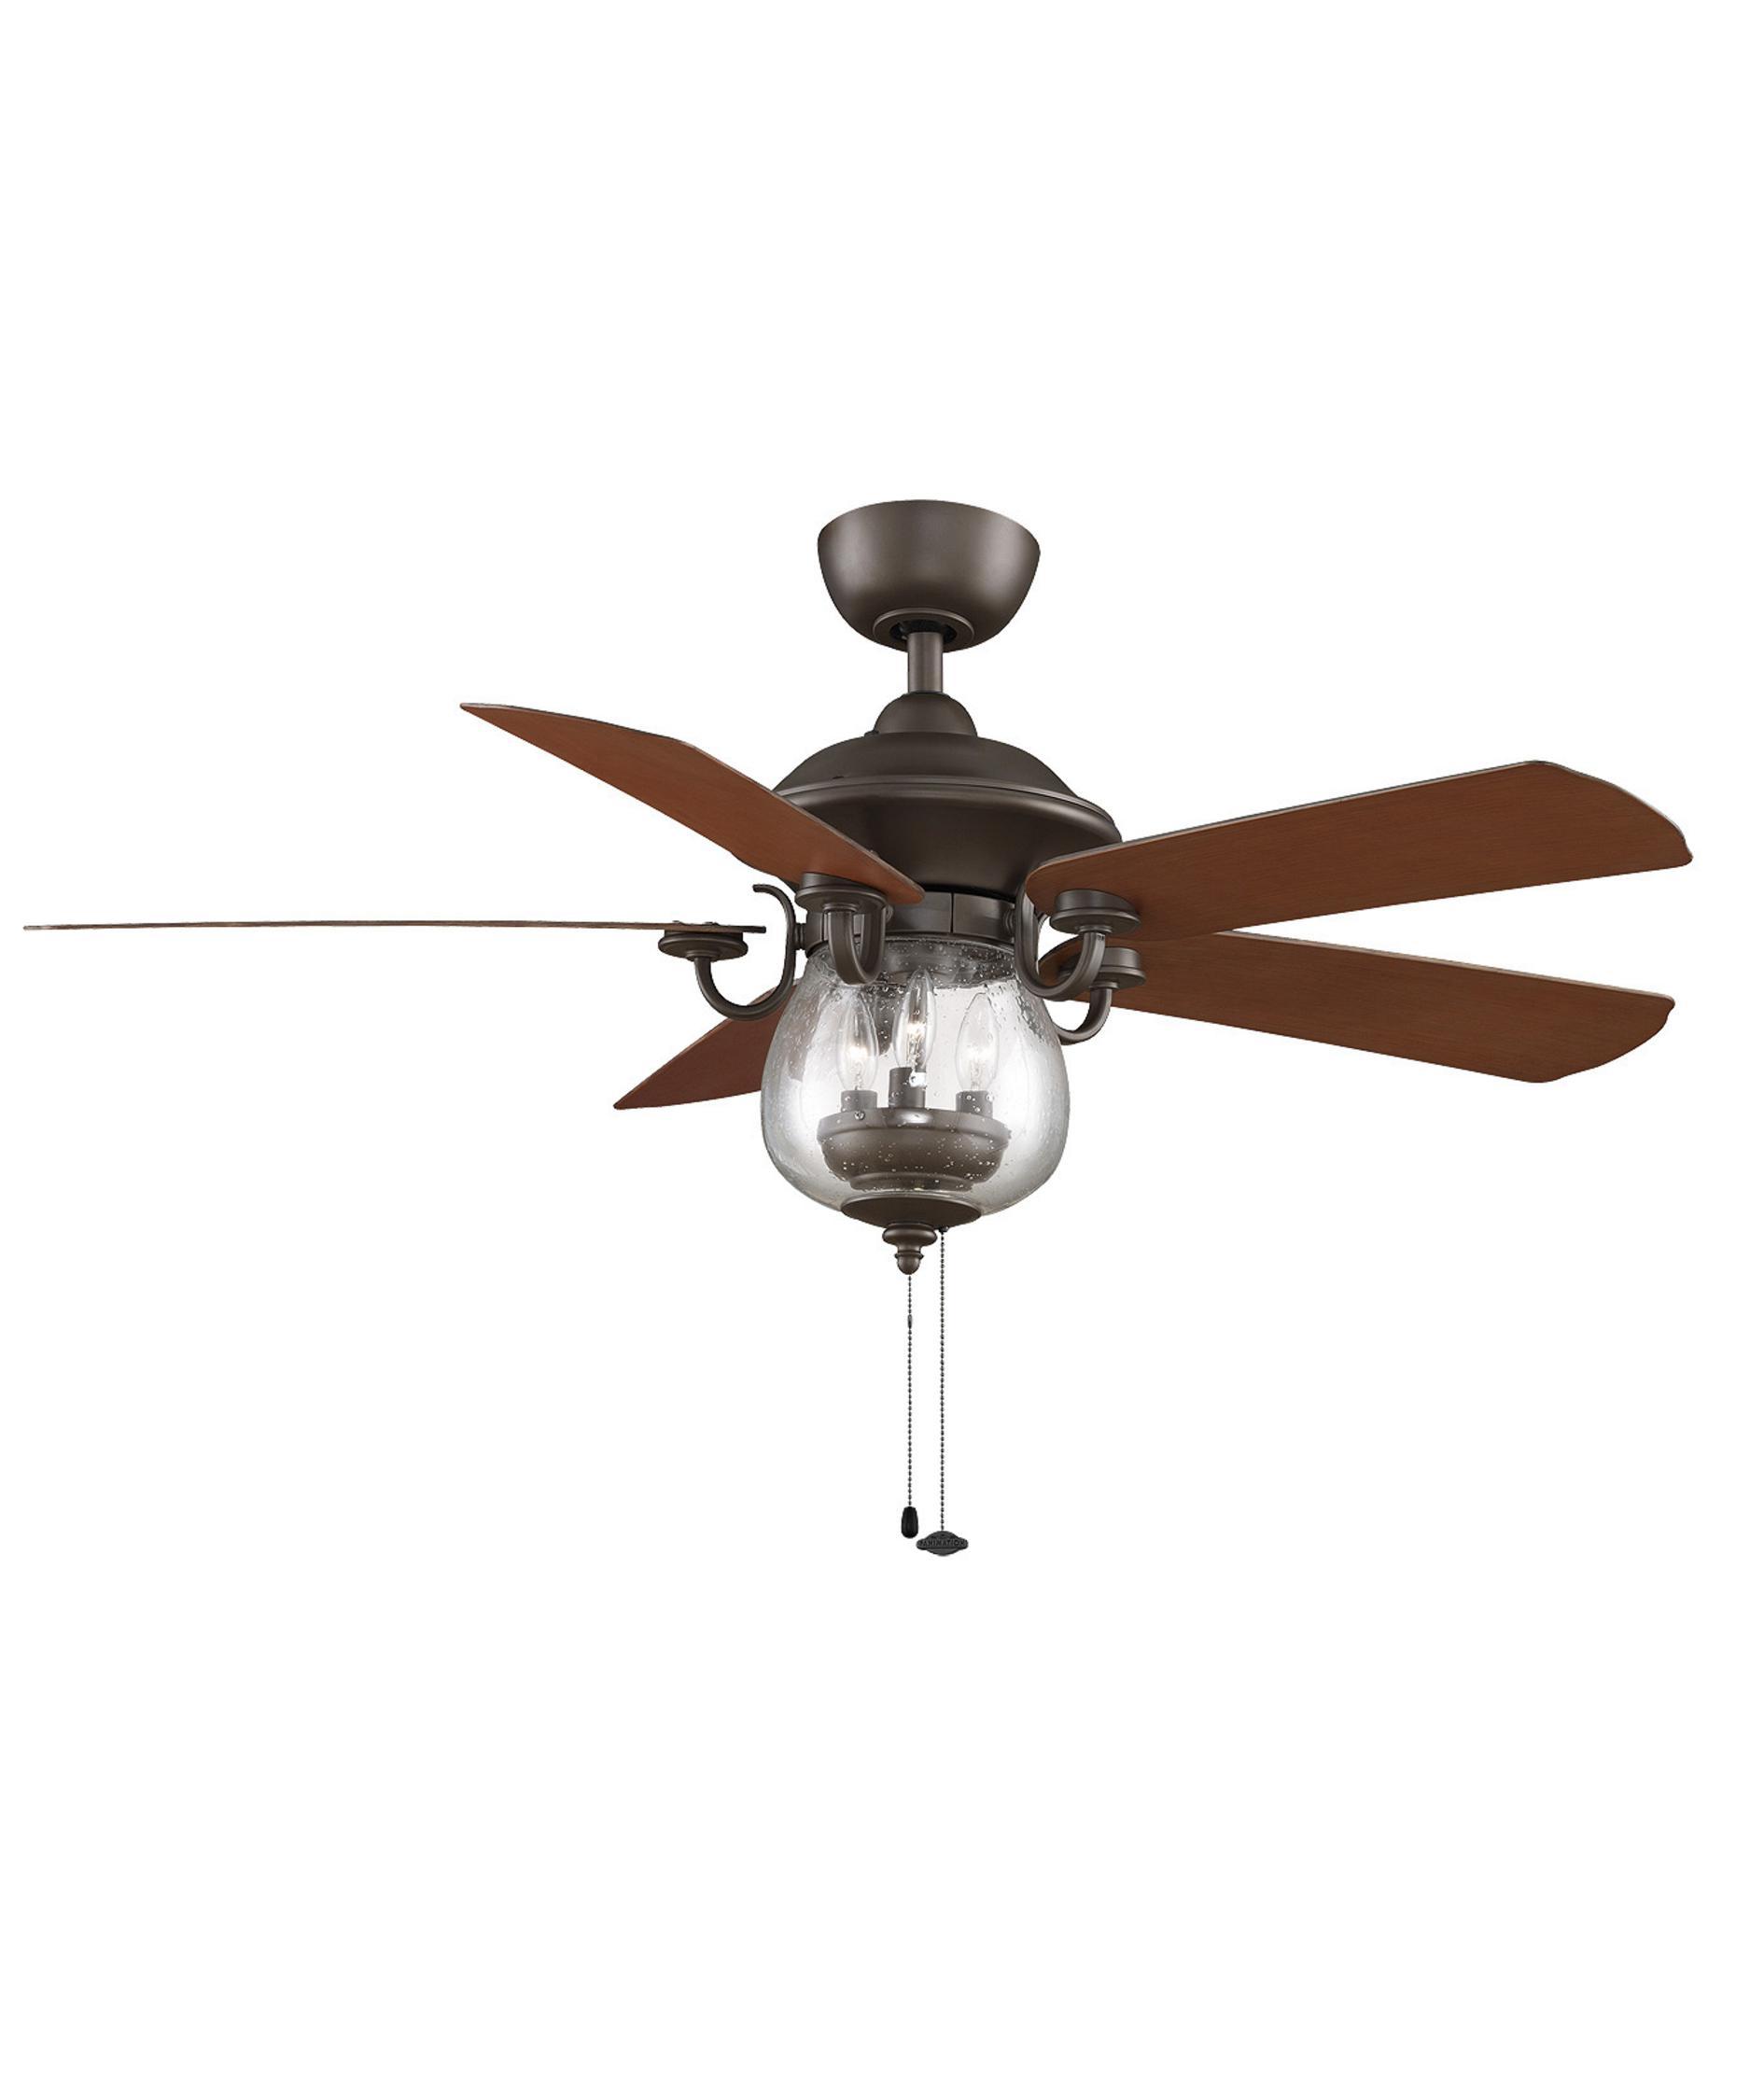 fanimation fp7954 crestford 52 inch 5 blade ceiling fan | capitol